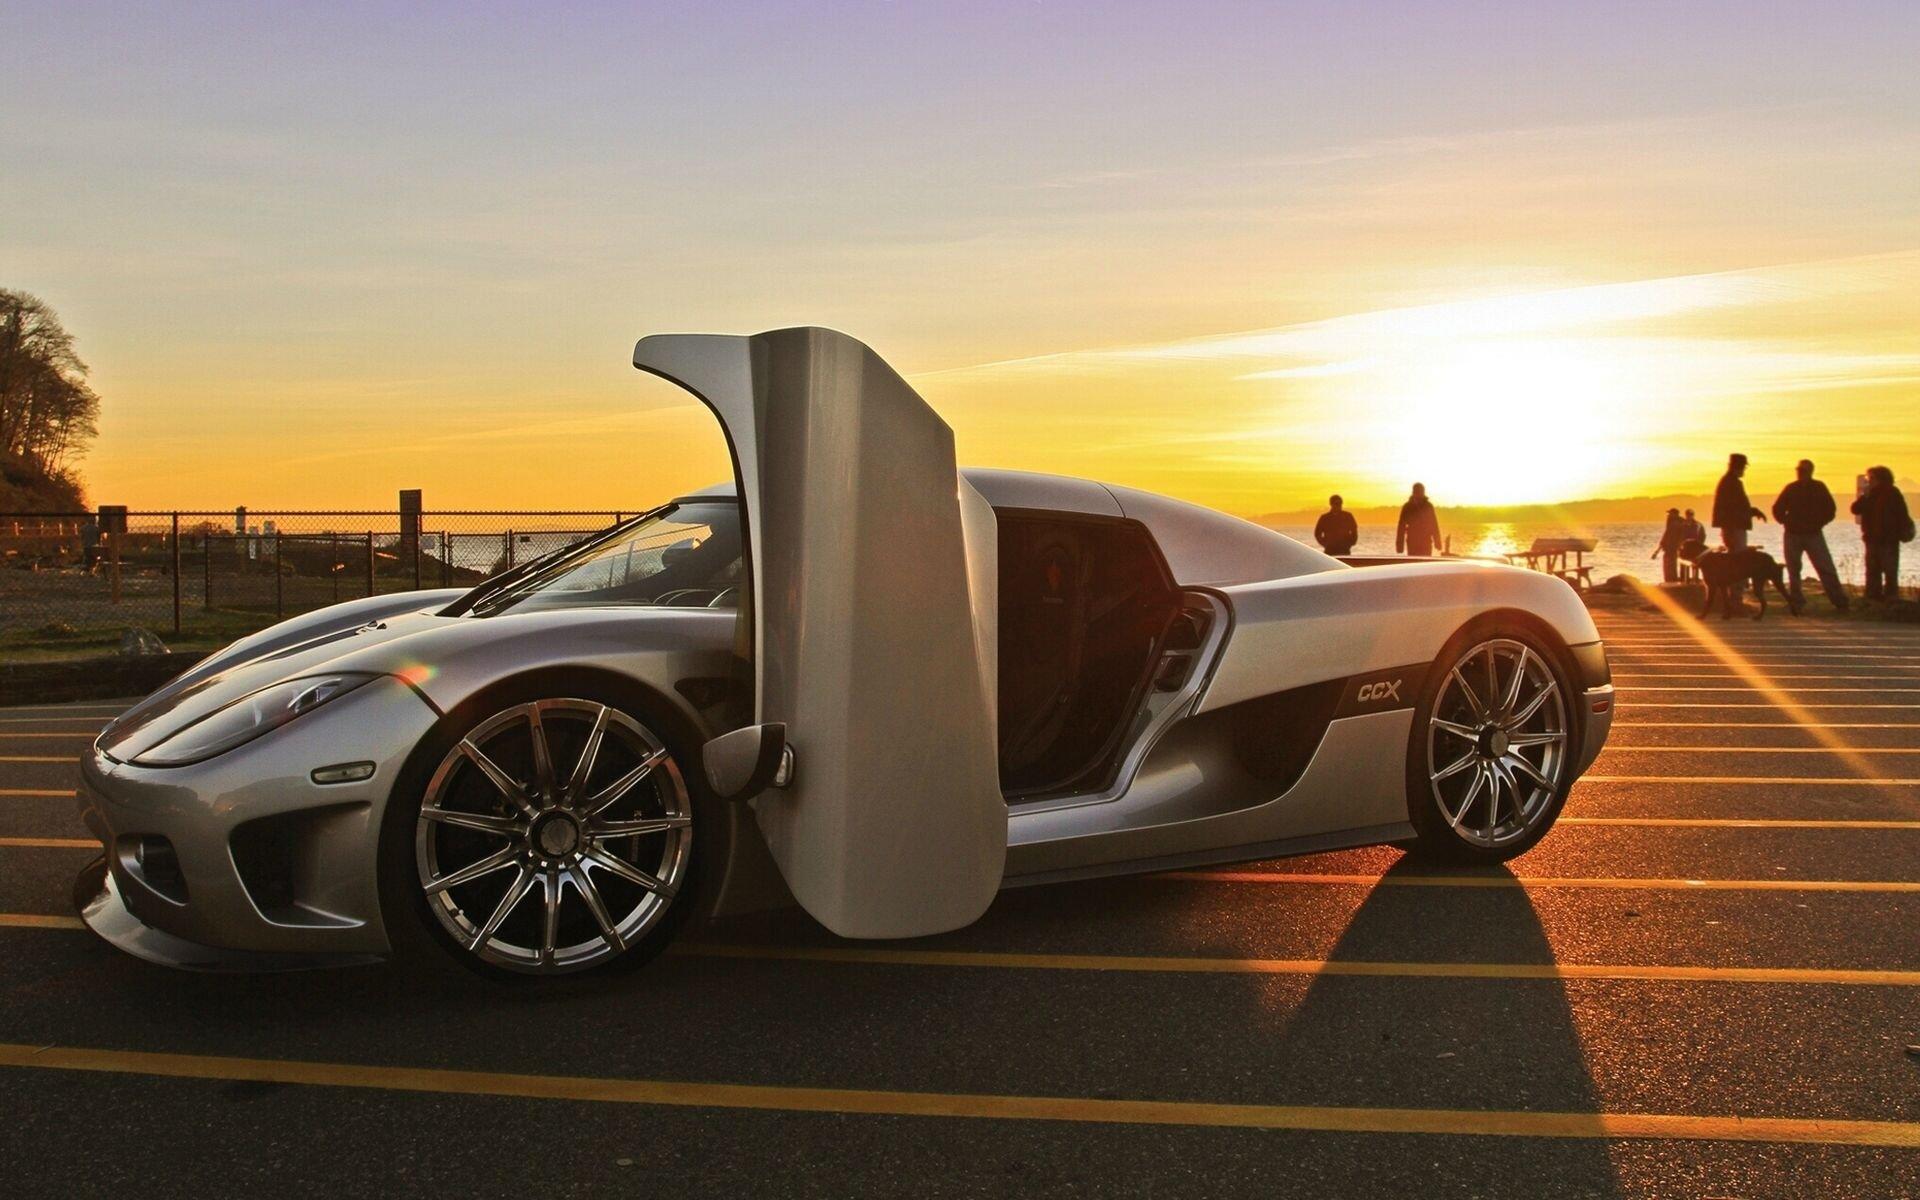 Ccx Car Wallpaper Koenigsegg Wallpapers Photos And Desktop Backgrounds Up